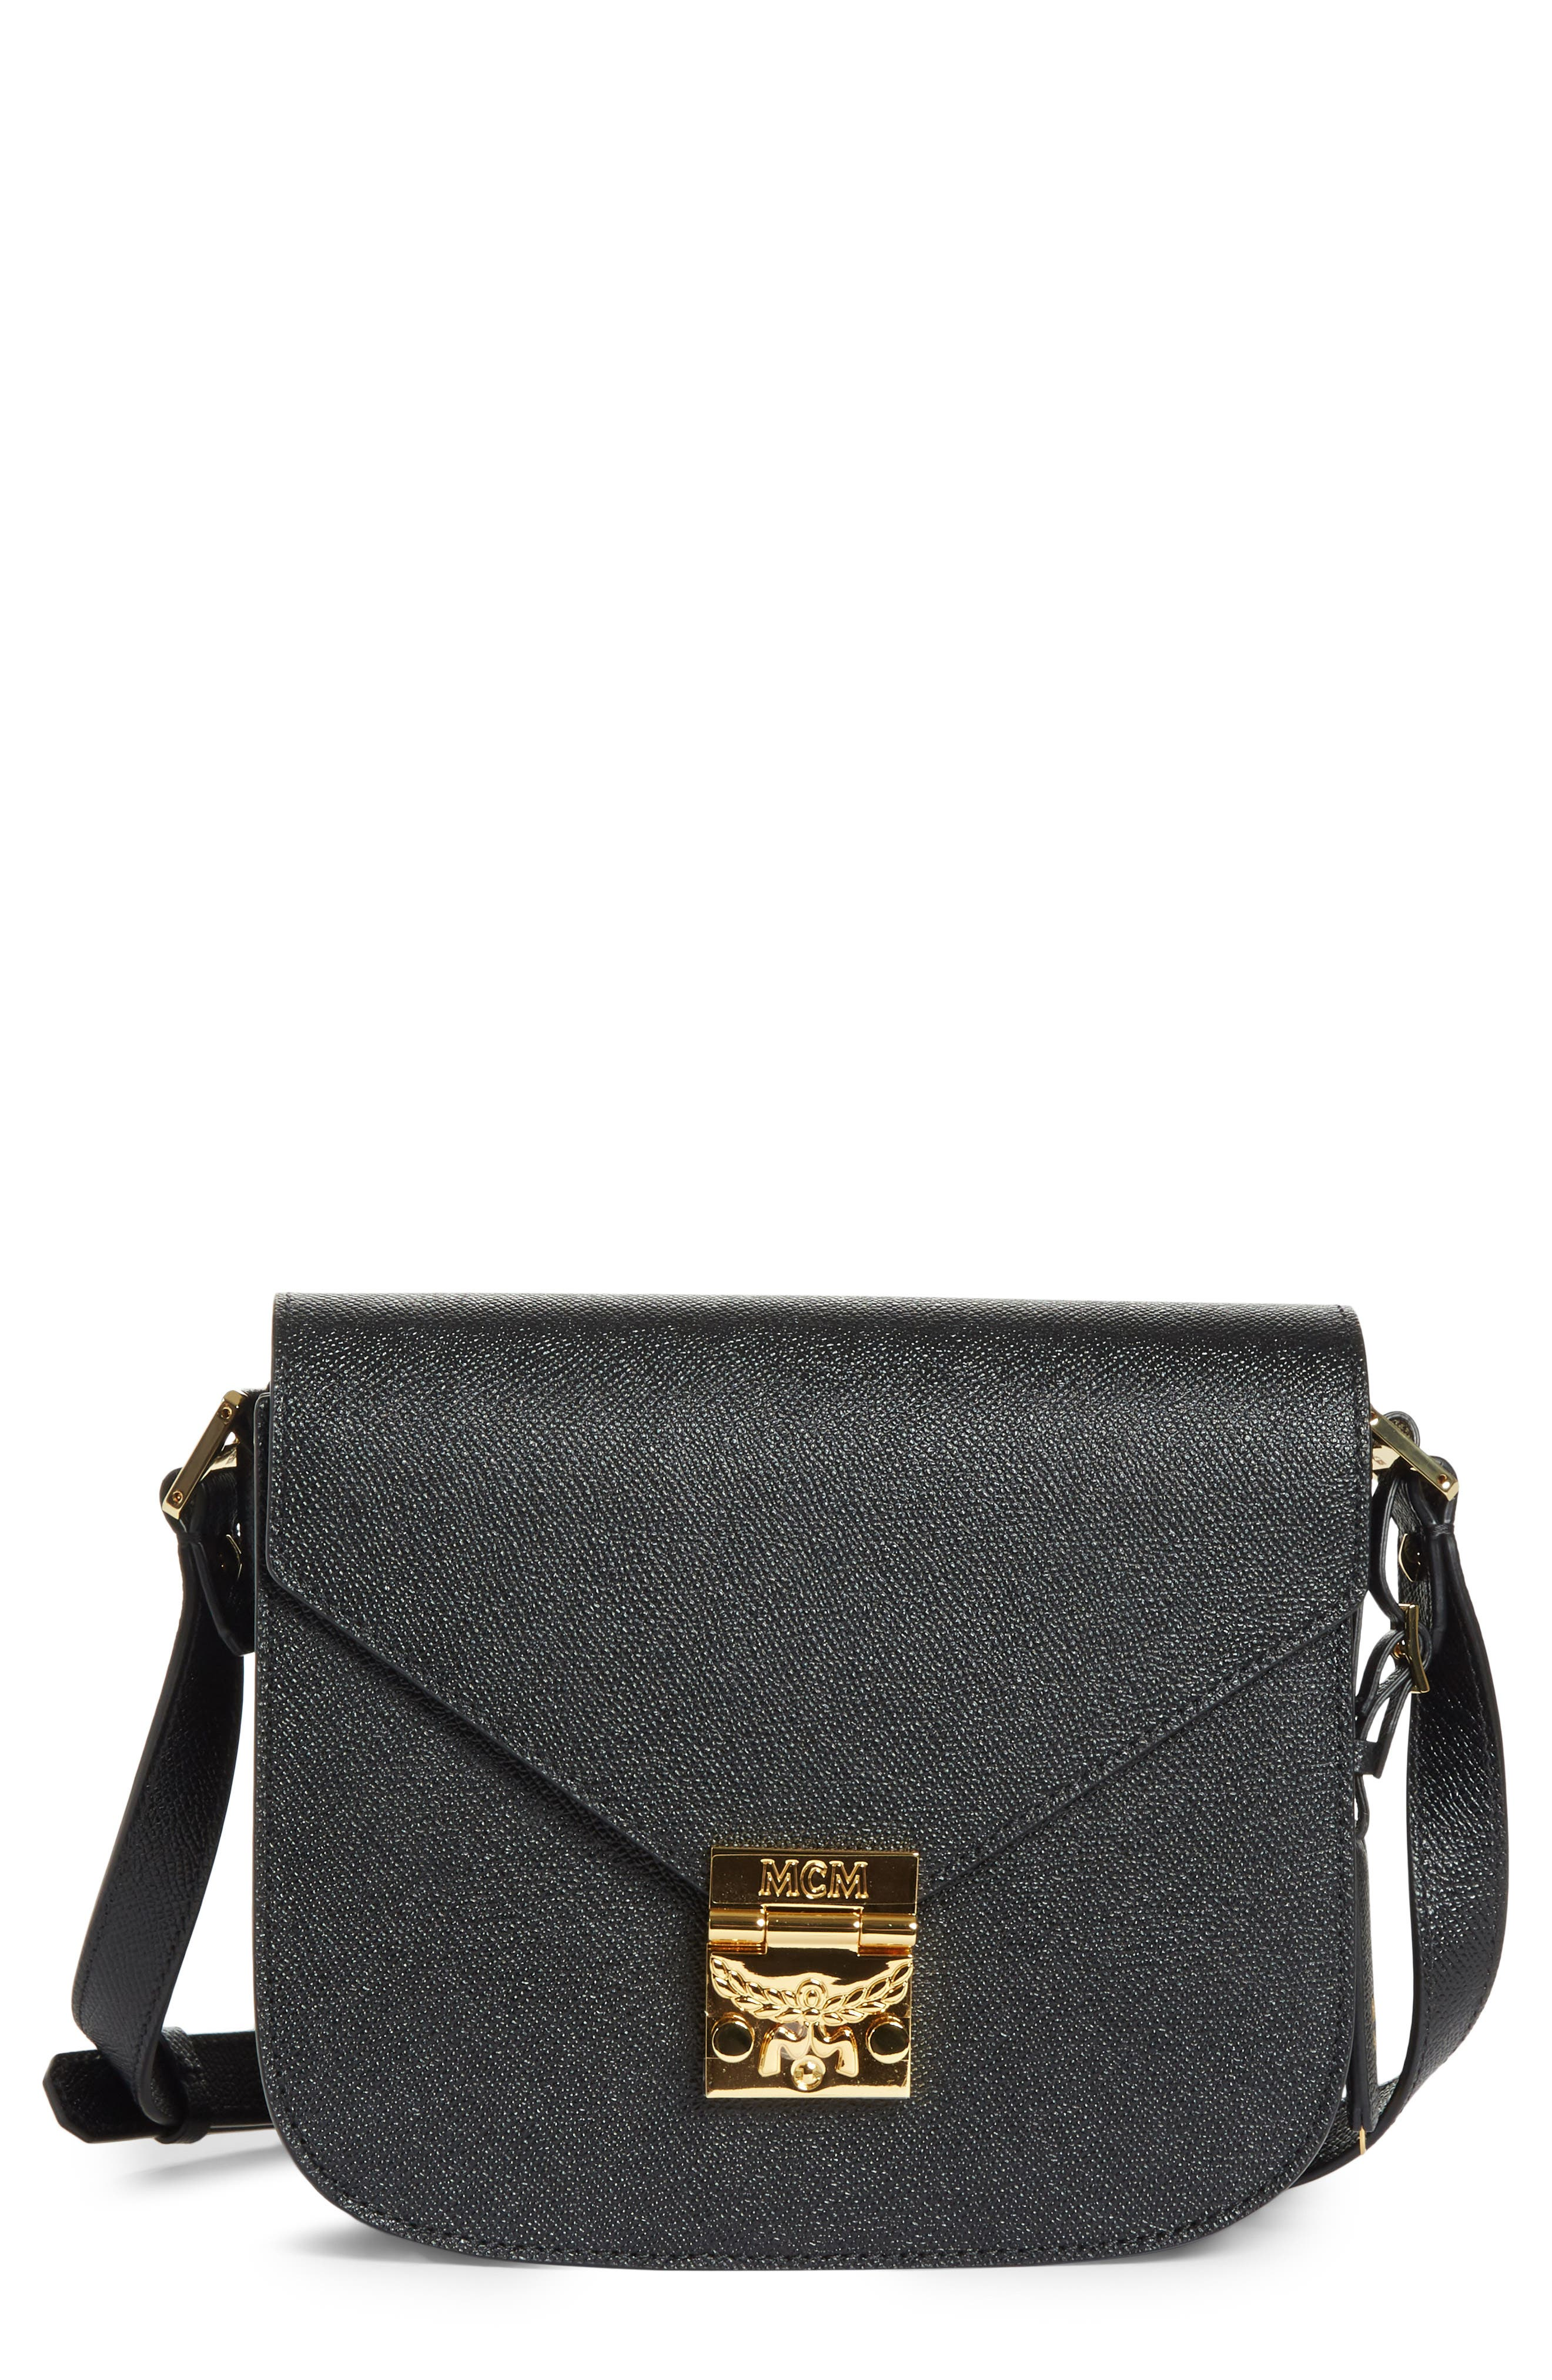 Small RGB Leather Shoulder Bag,                             Main thumbnail 1, color,                             BLACK